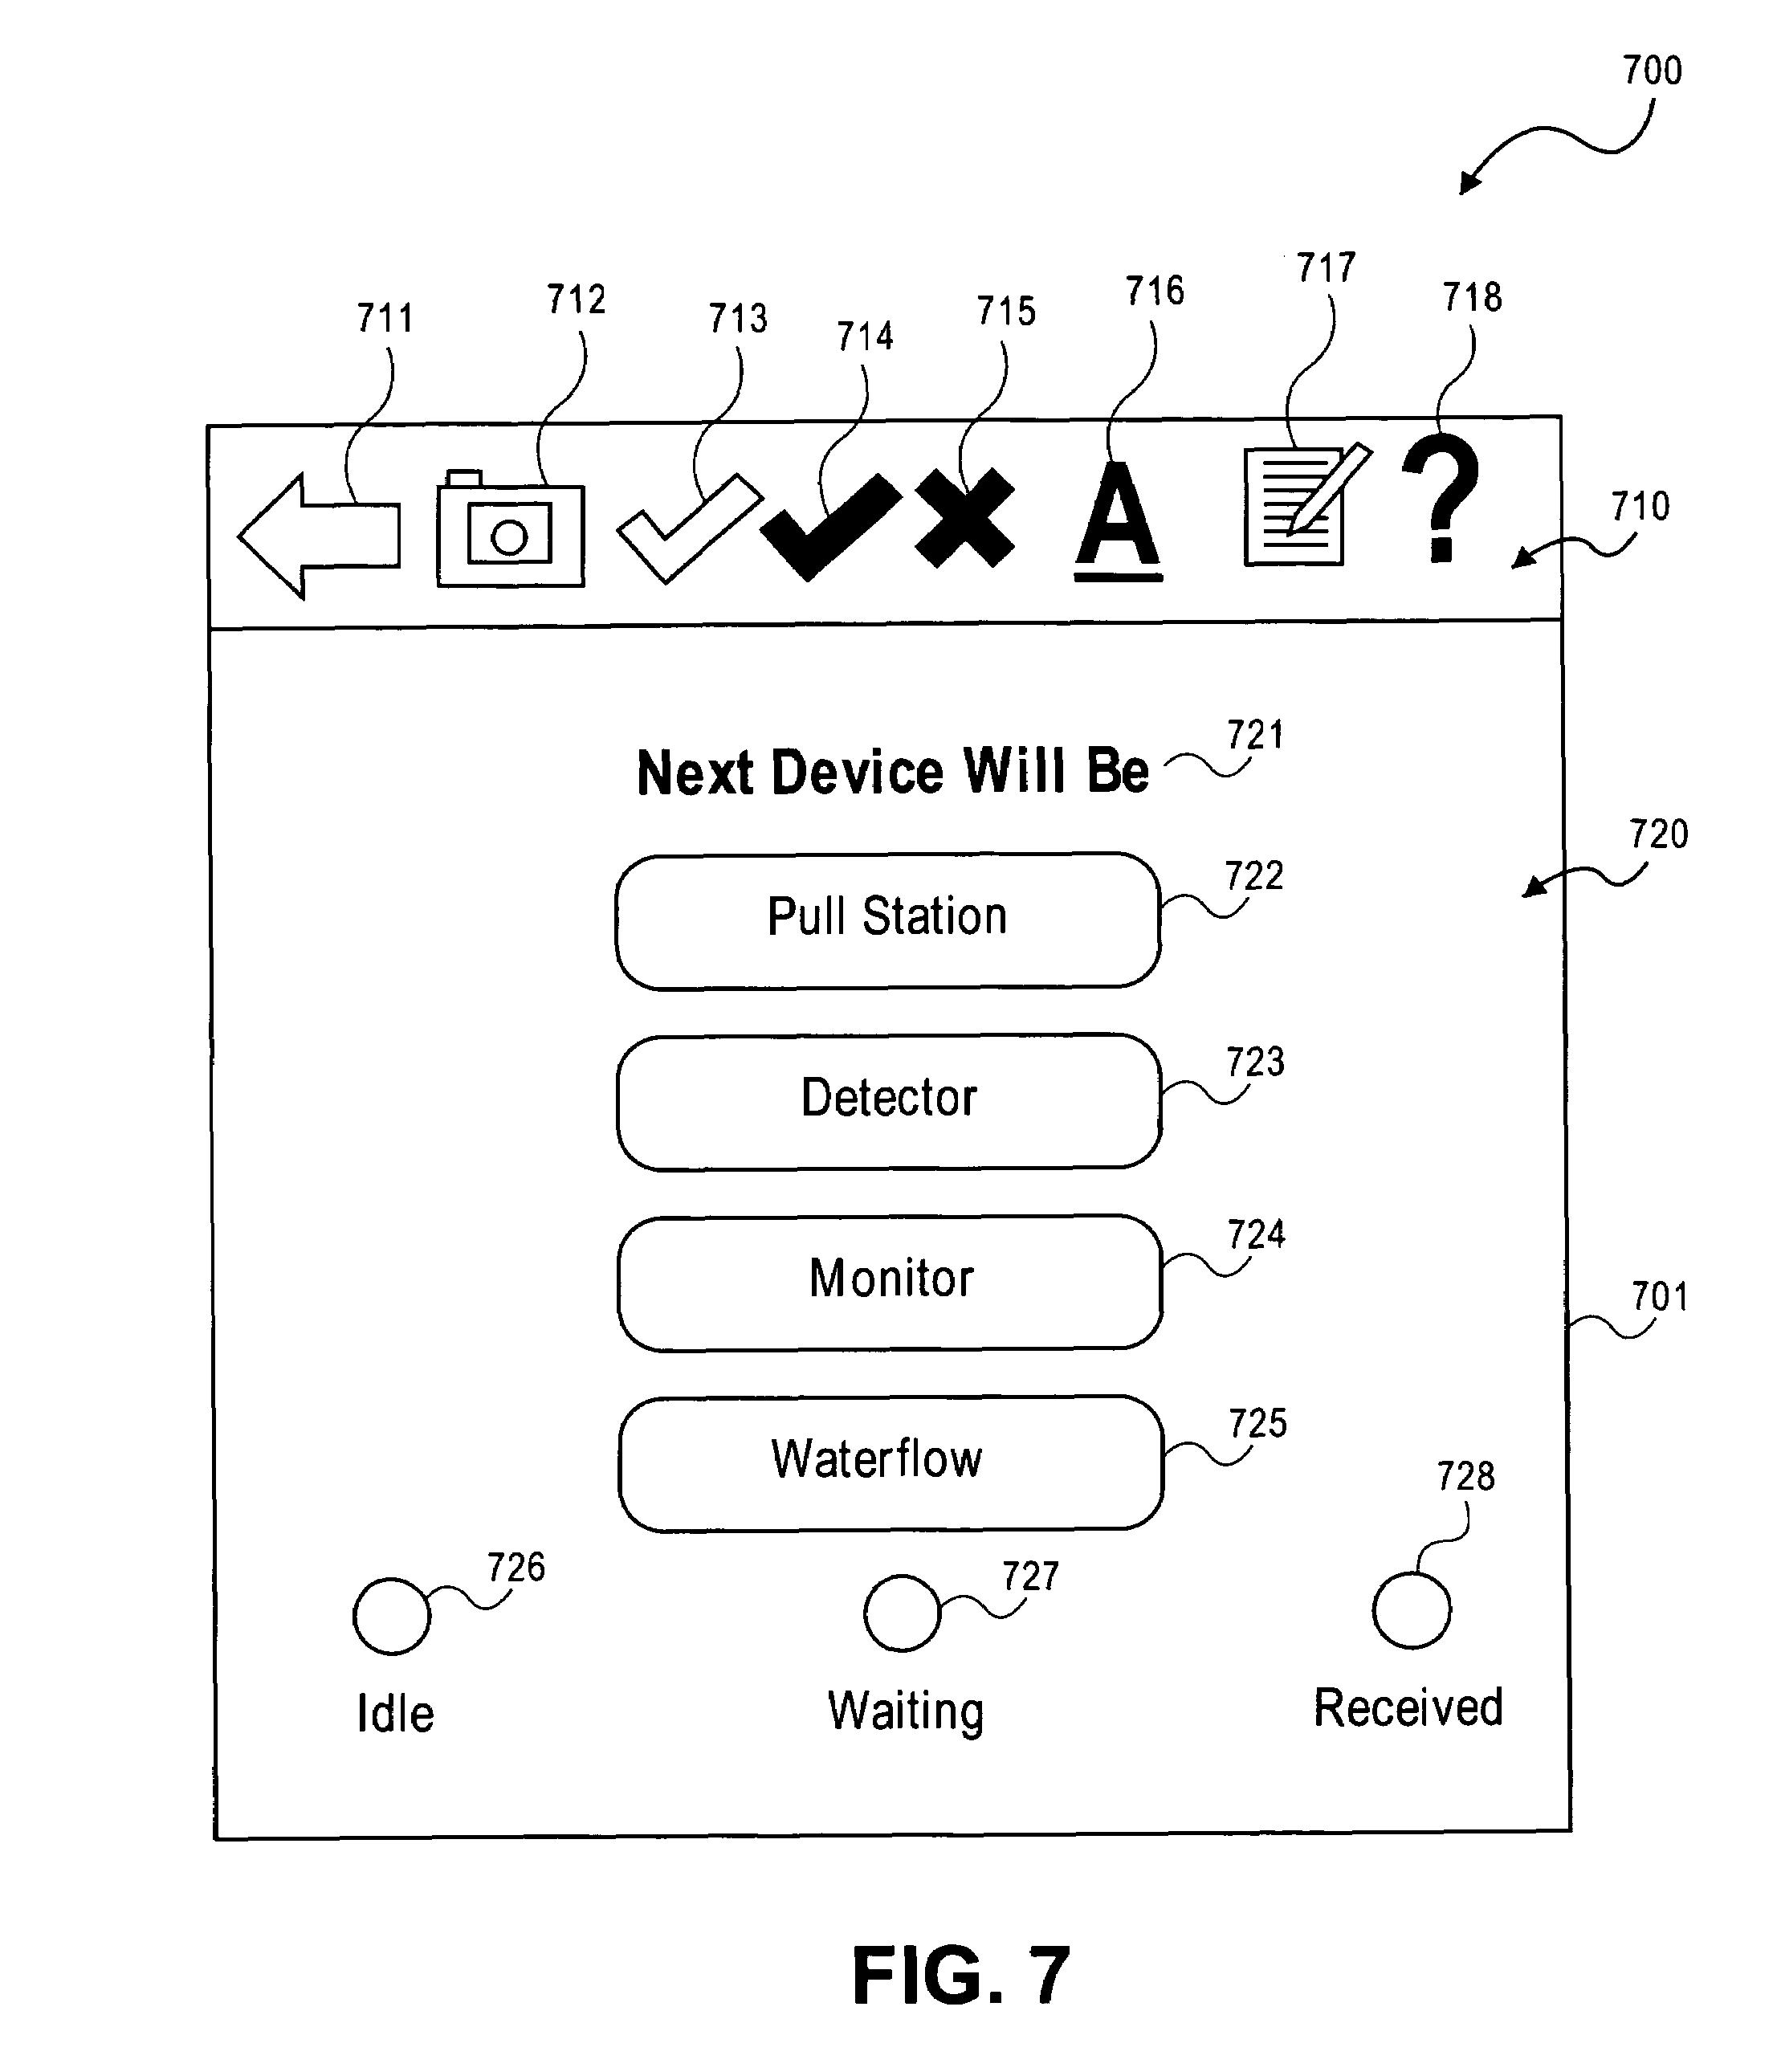 Alarm Circuit Jk Flip Flop Schematic Not Lossing Wiring Diagram Moore Matic A Garage Door Openers Diagrams Industries Sta 35 Table